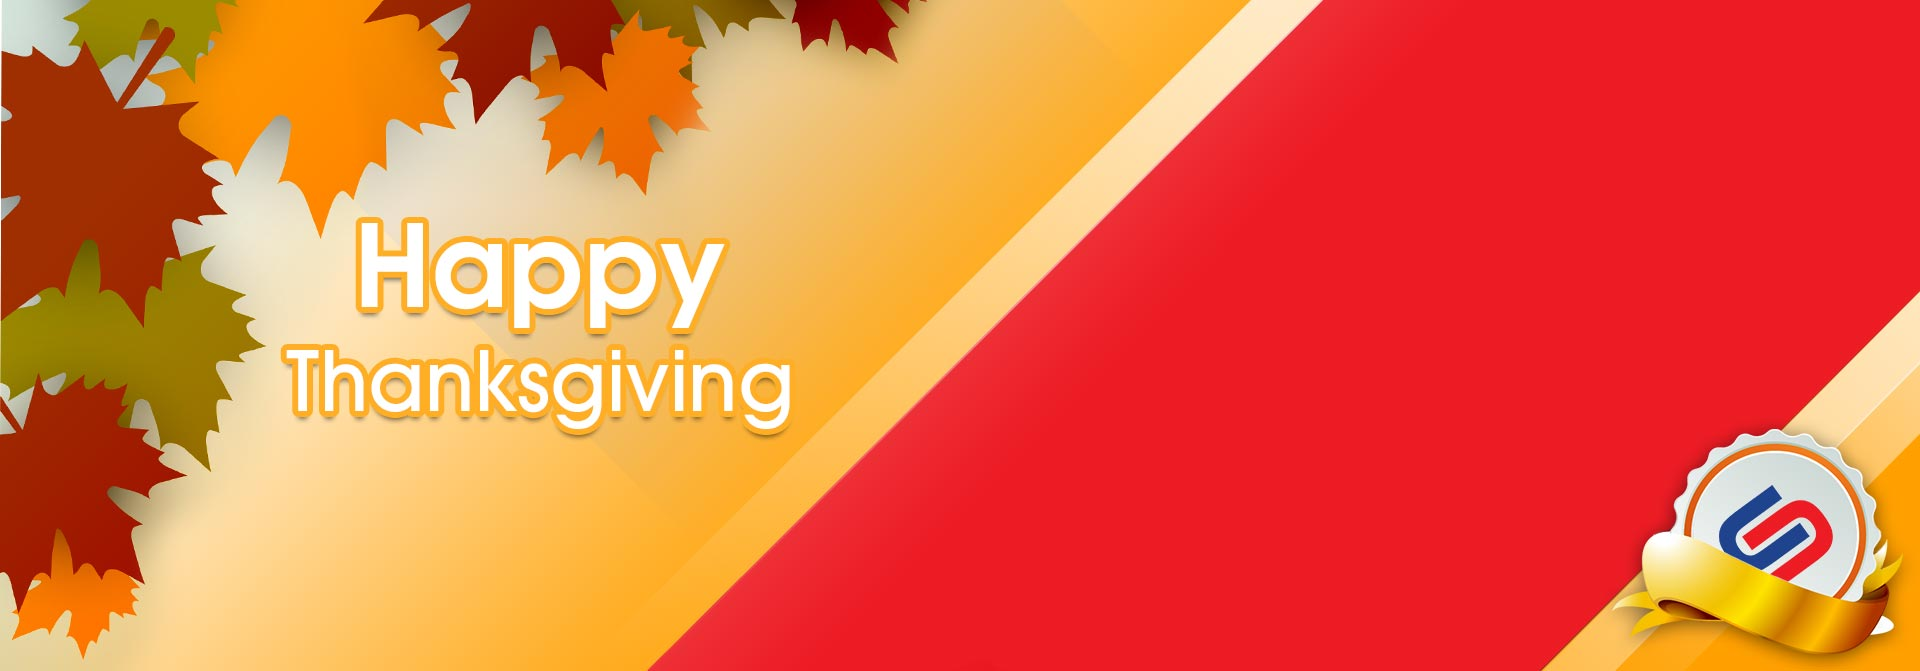 Happy Thanksgiving from Univista Insurance